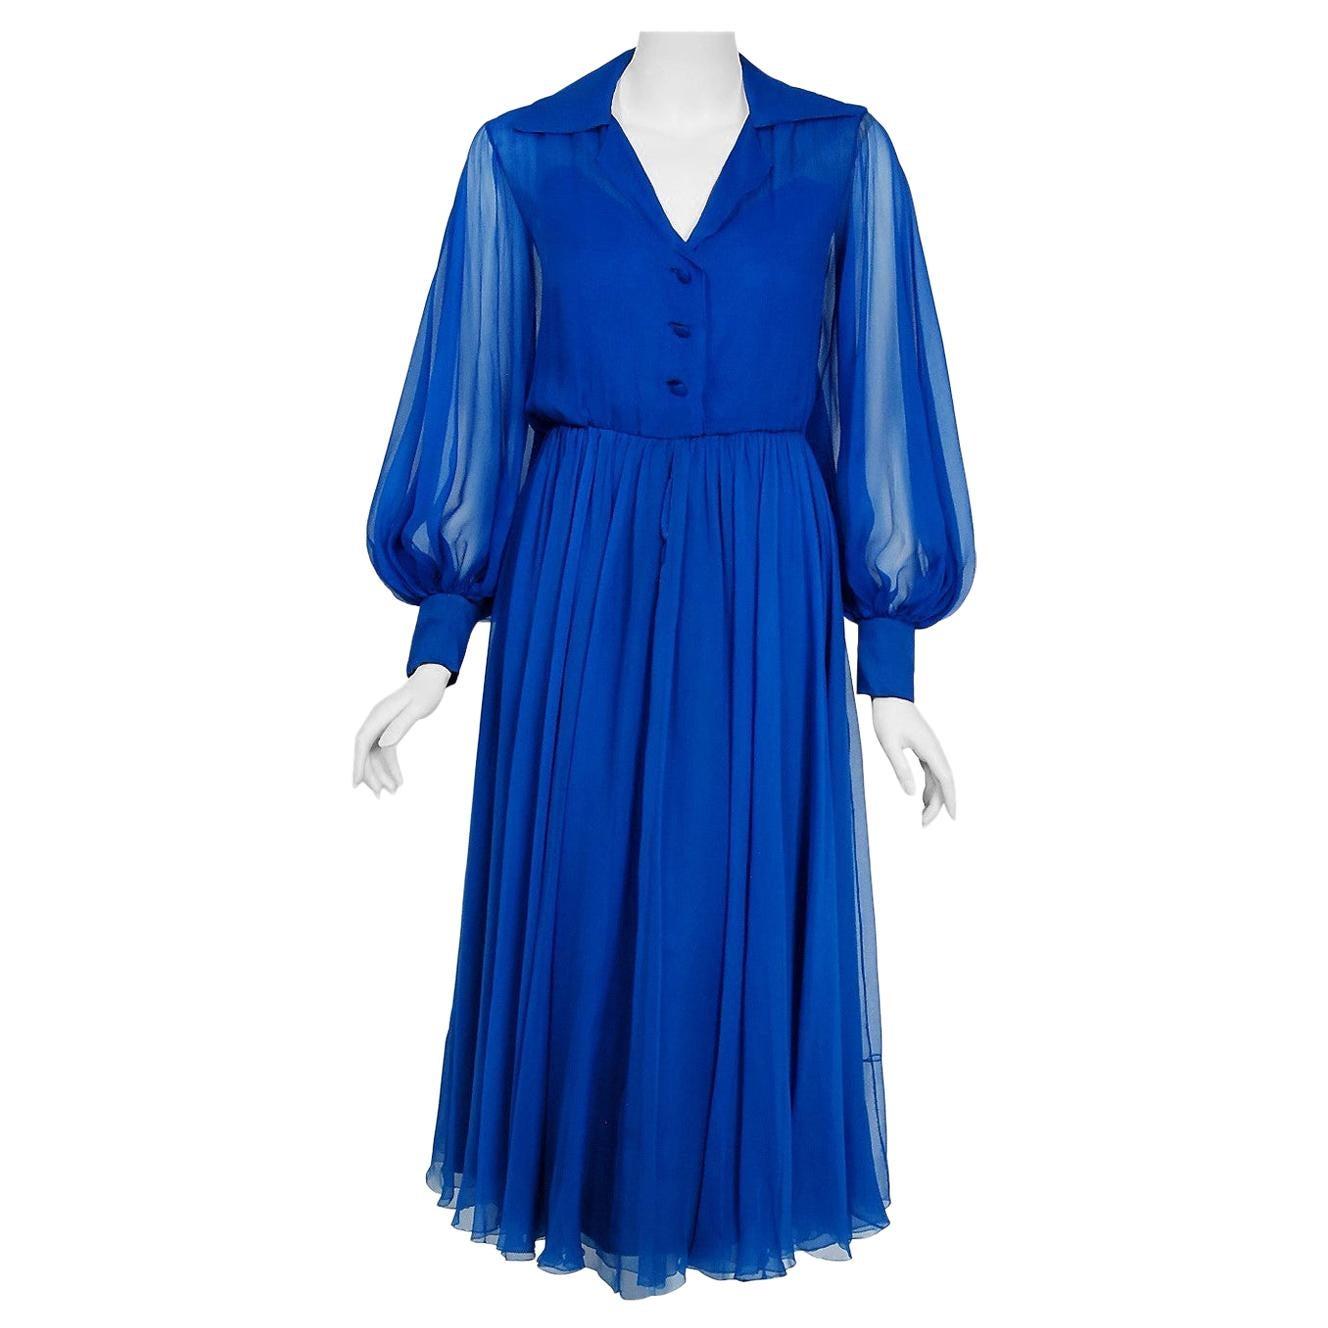 Vintage 1973 Christian Dior Couture Sapphire Blue Chiffon Billow-Sleeve Dress